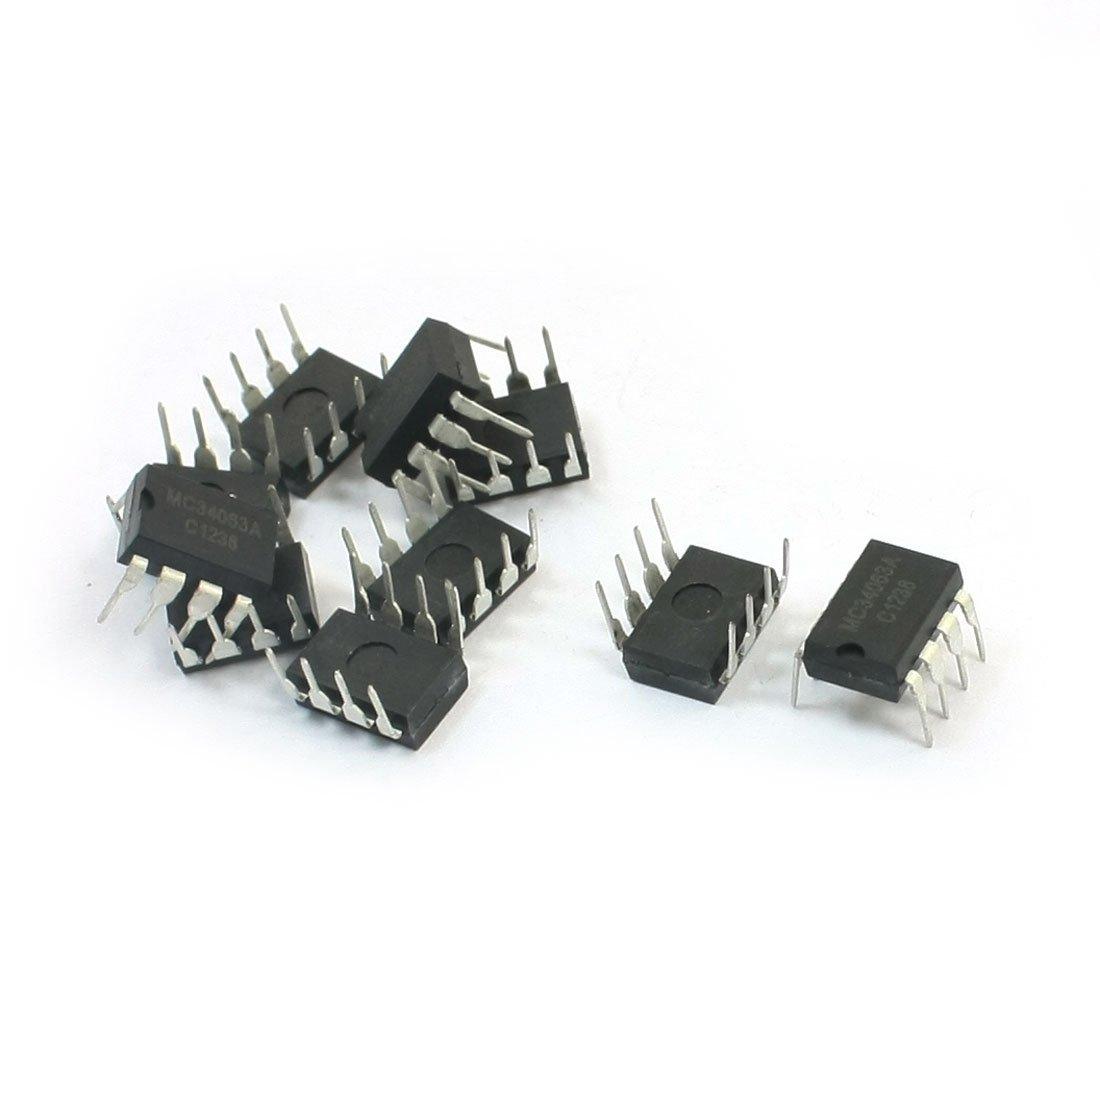 Mc34063a Mc34063 Dc To Converters Buck Boost The Stepup Converter Electronics